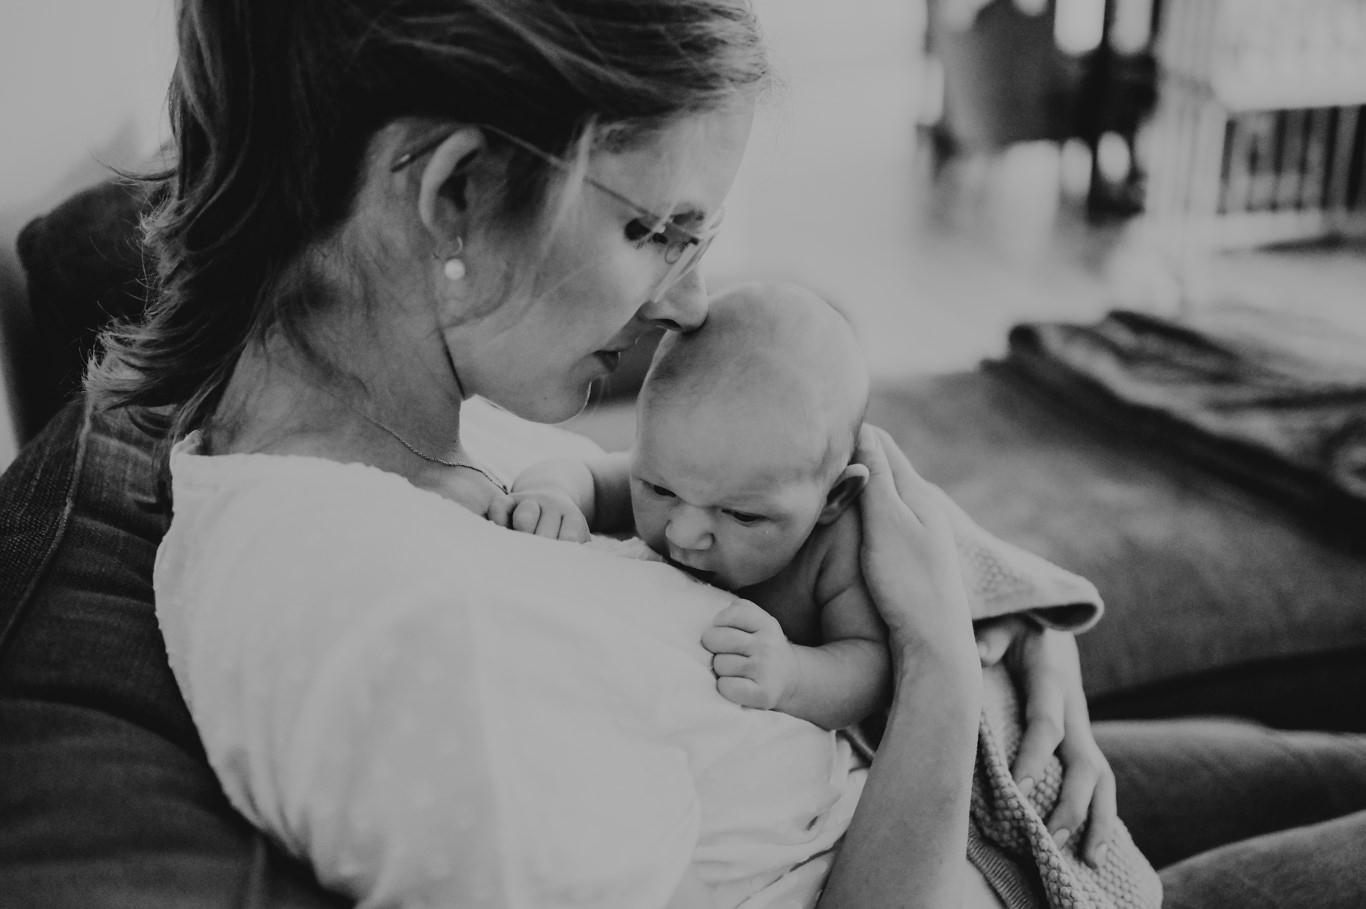 Baby Fotograf Mannheim Babyfotograf Karlsruhe Hedelberg Newborn Neugeborenen Fotografie Bilder